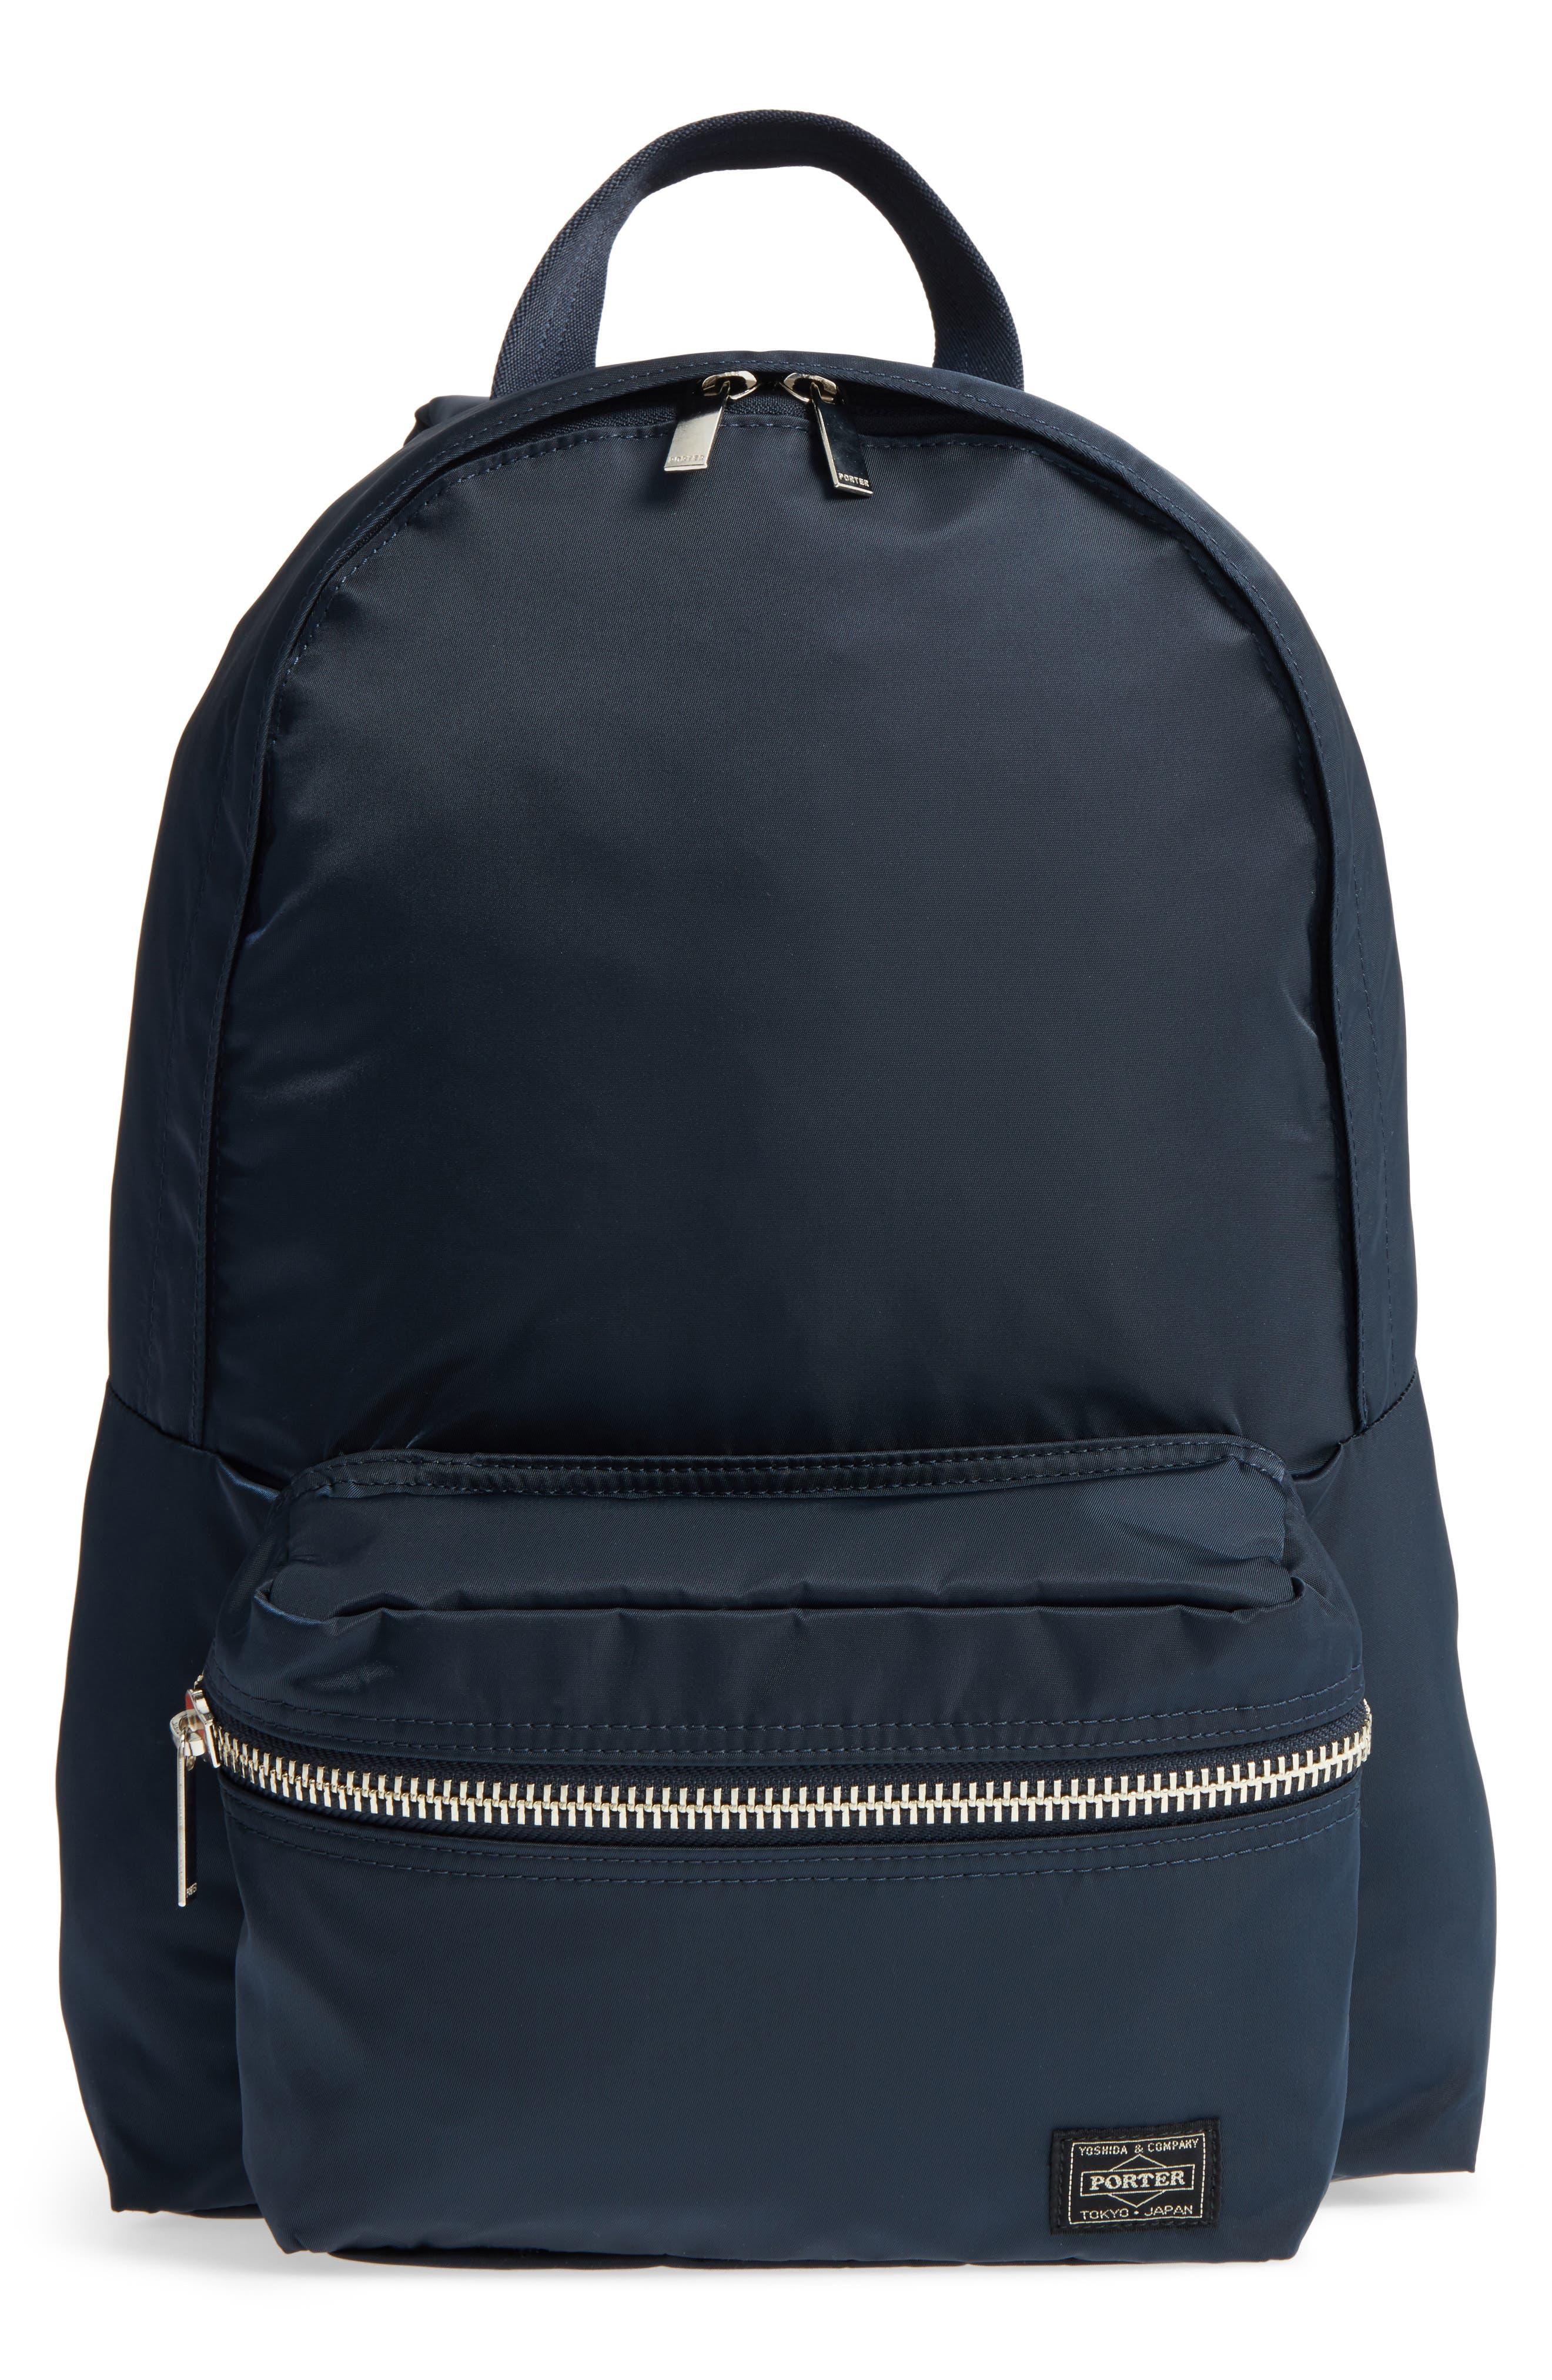 Porter-Yoshida & Co. Daily Backpack,                         Main,                         color, 400